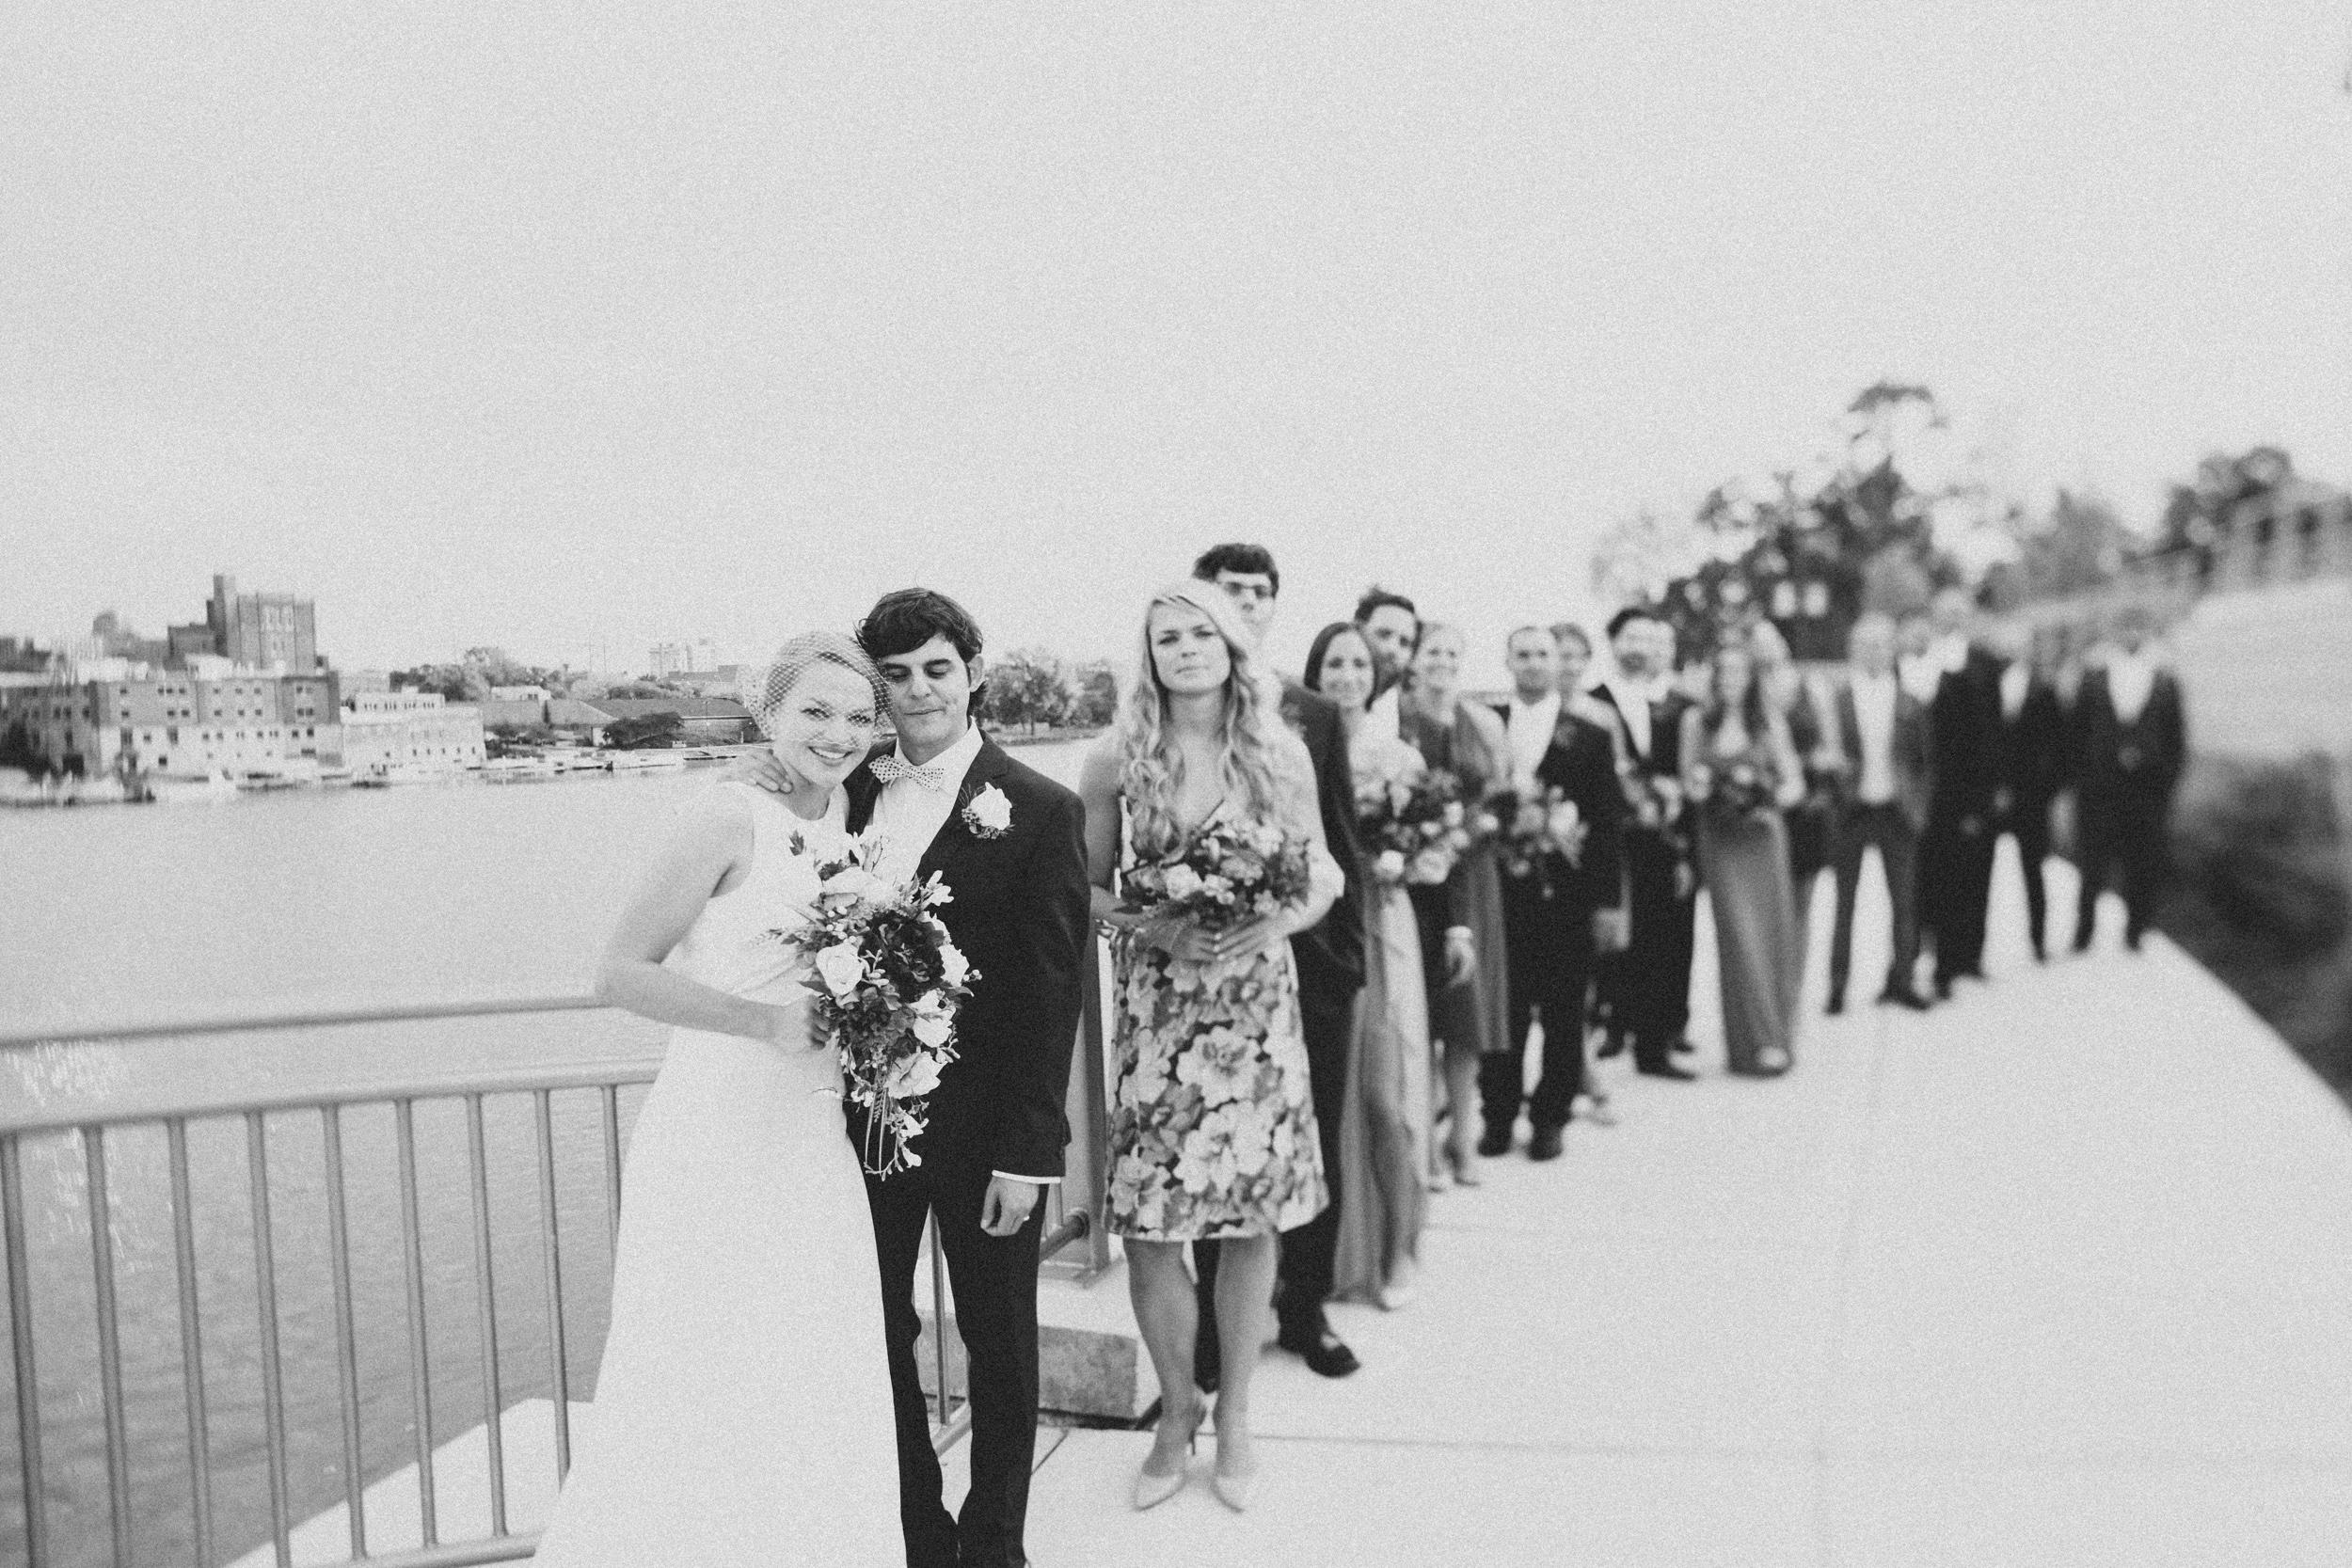 10-05-2013 maggie & adam wedding photography by brian milo-145.jpg